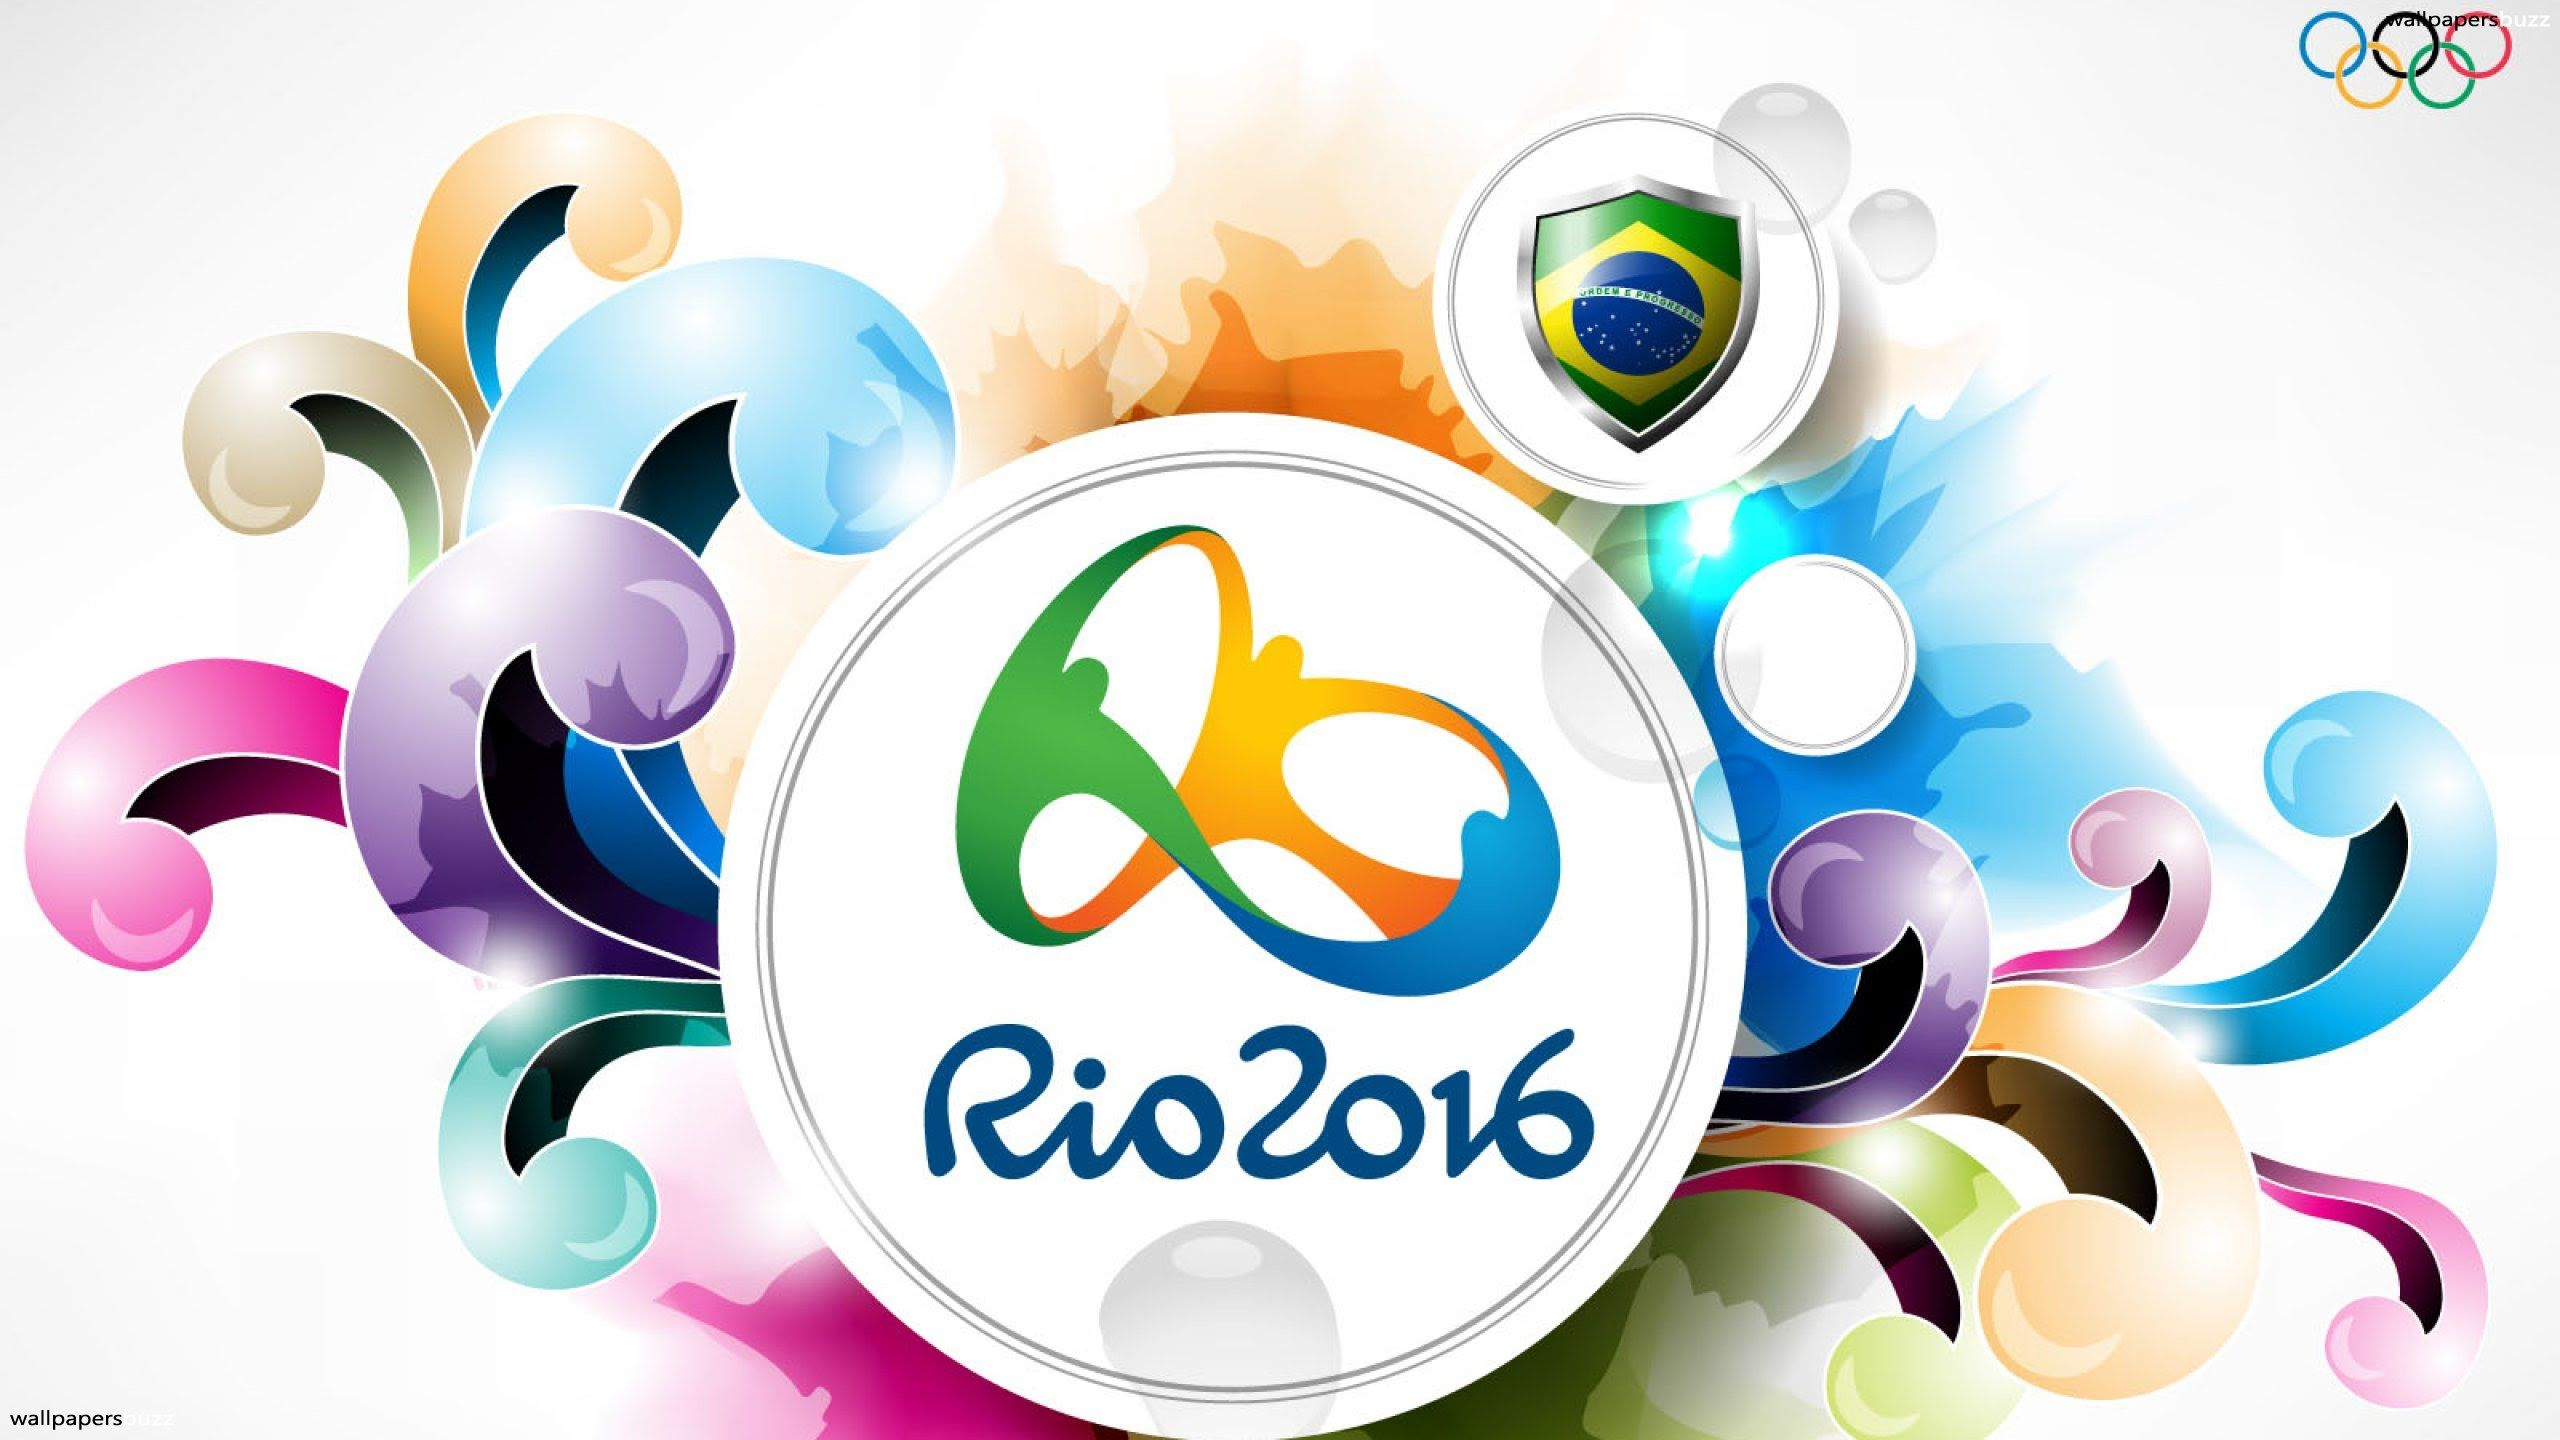 Olympic rings logo rio 2016 olympics logo designed by fred gelli - Rio Olympics 2016 Sardar Singh Dropped As Captain Pr Sreejesh To Lead Indian 2016 Olympics Pinterest Rio Olympics 2016 Hockey Teams And Olympics